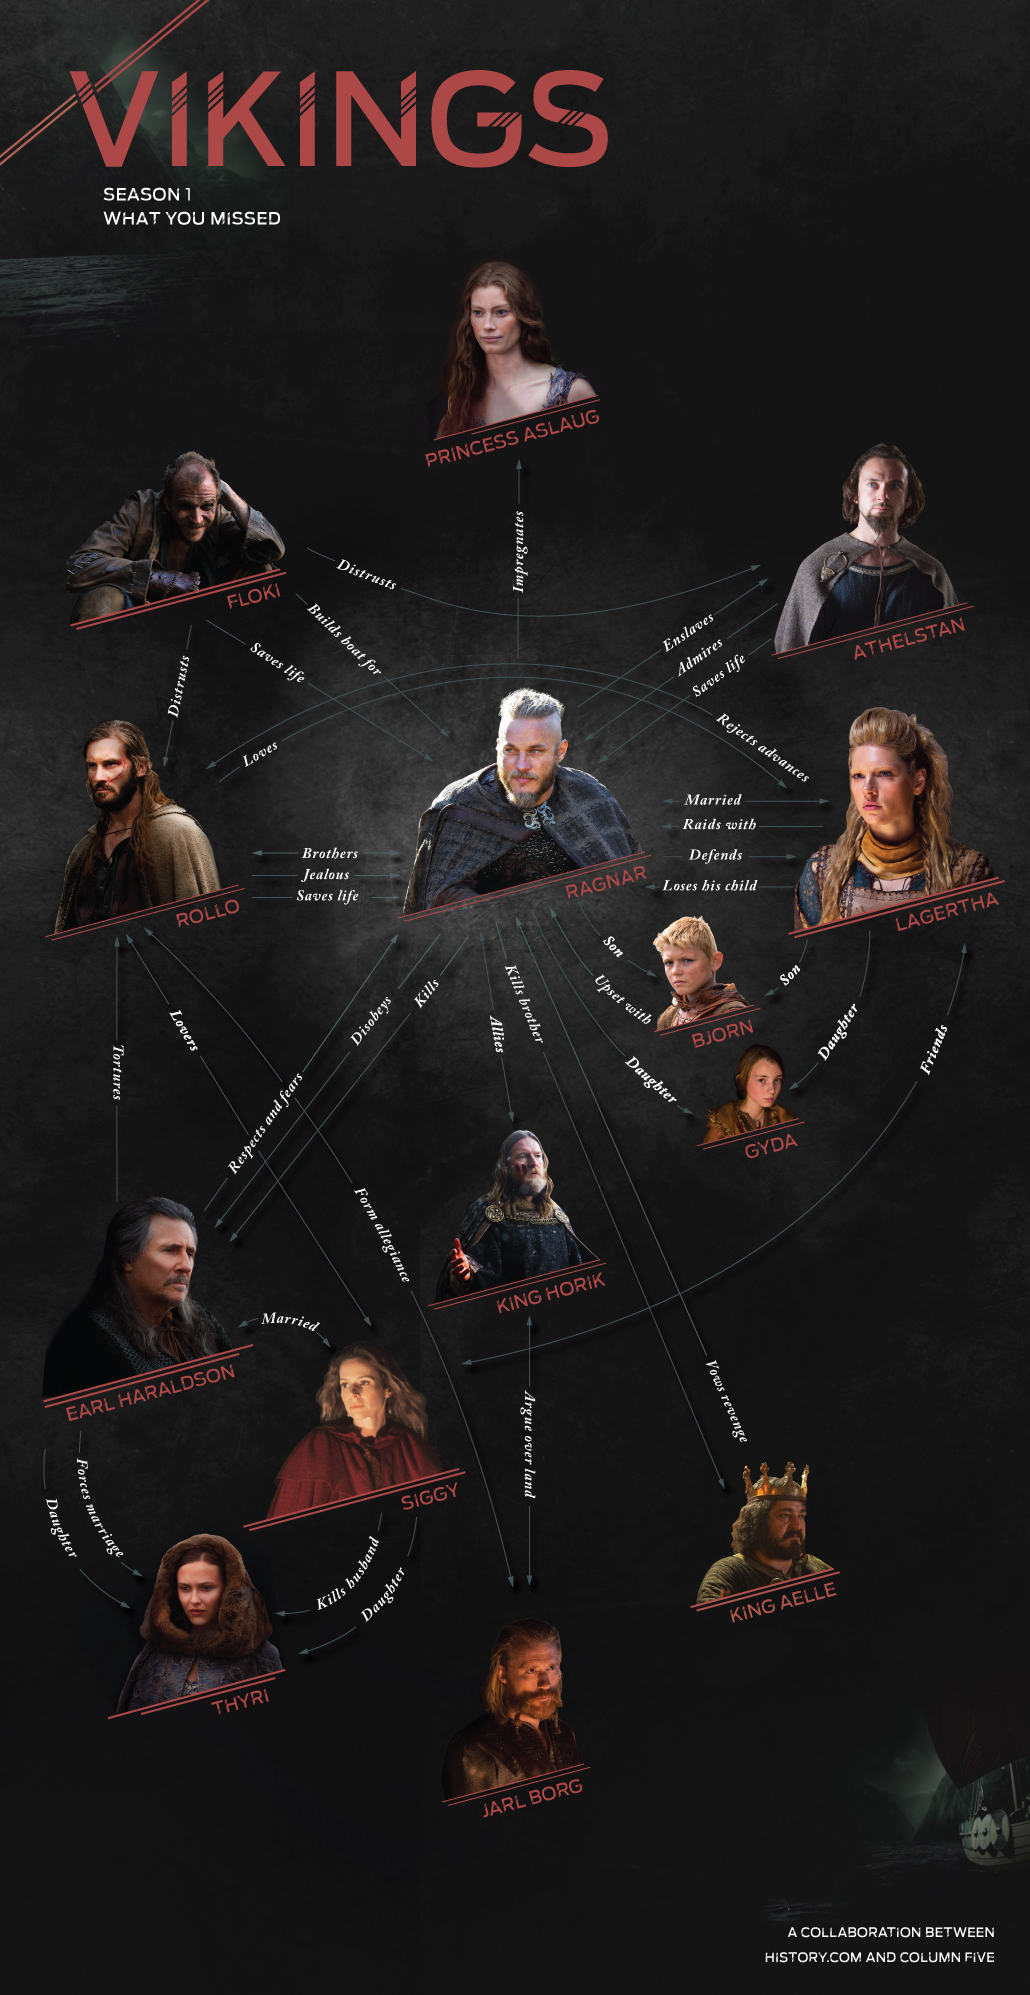 Vikings Season 1 Infographic